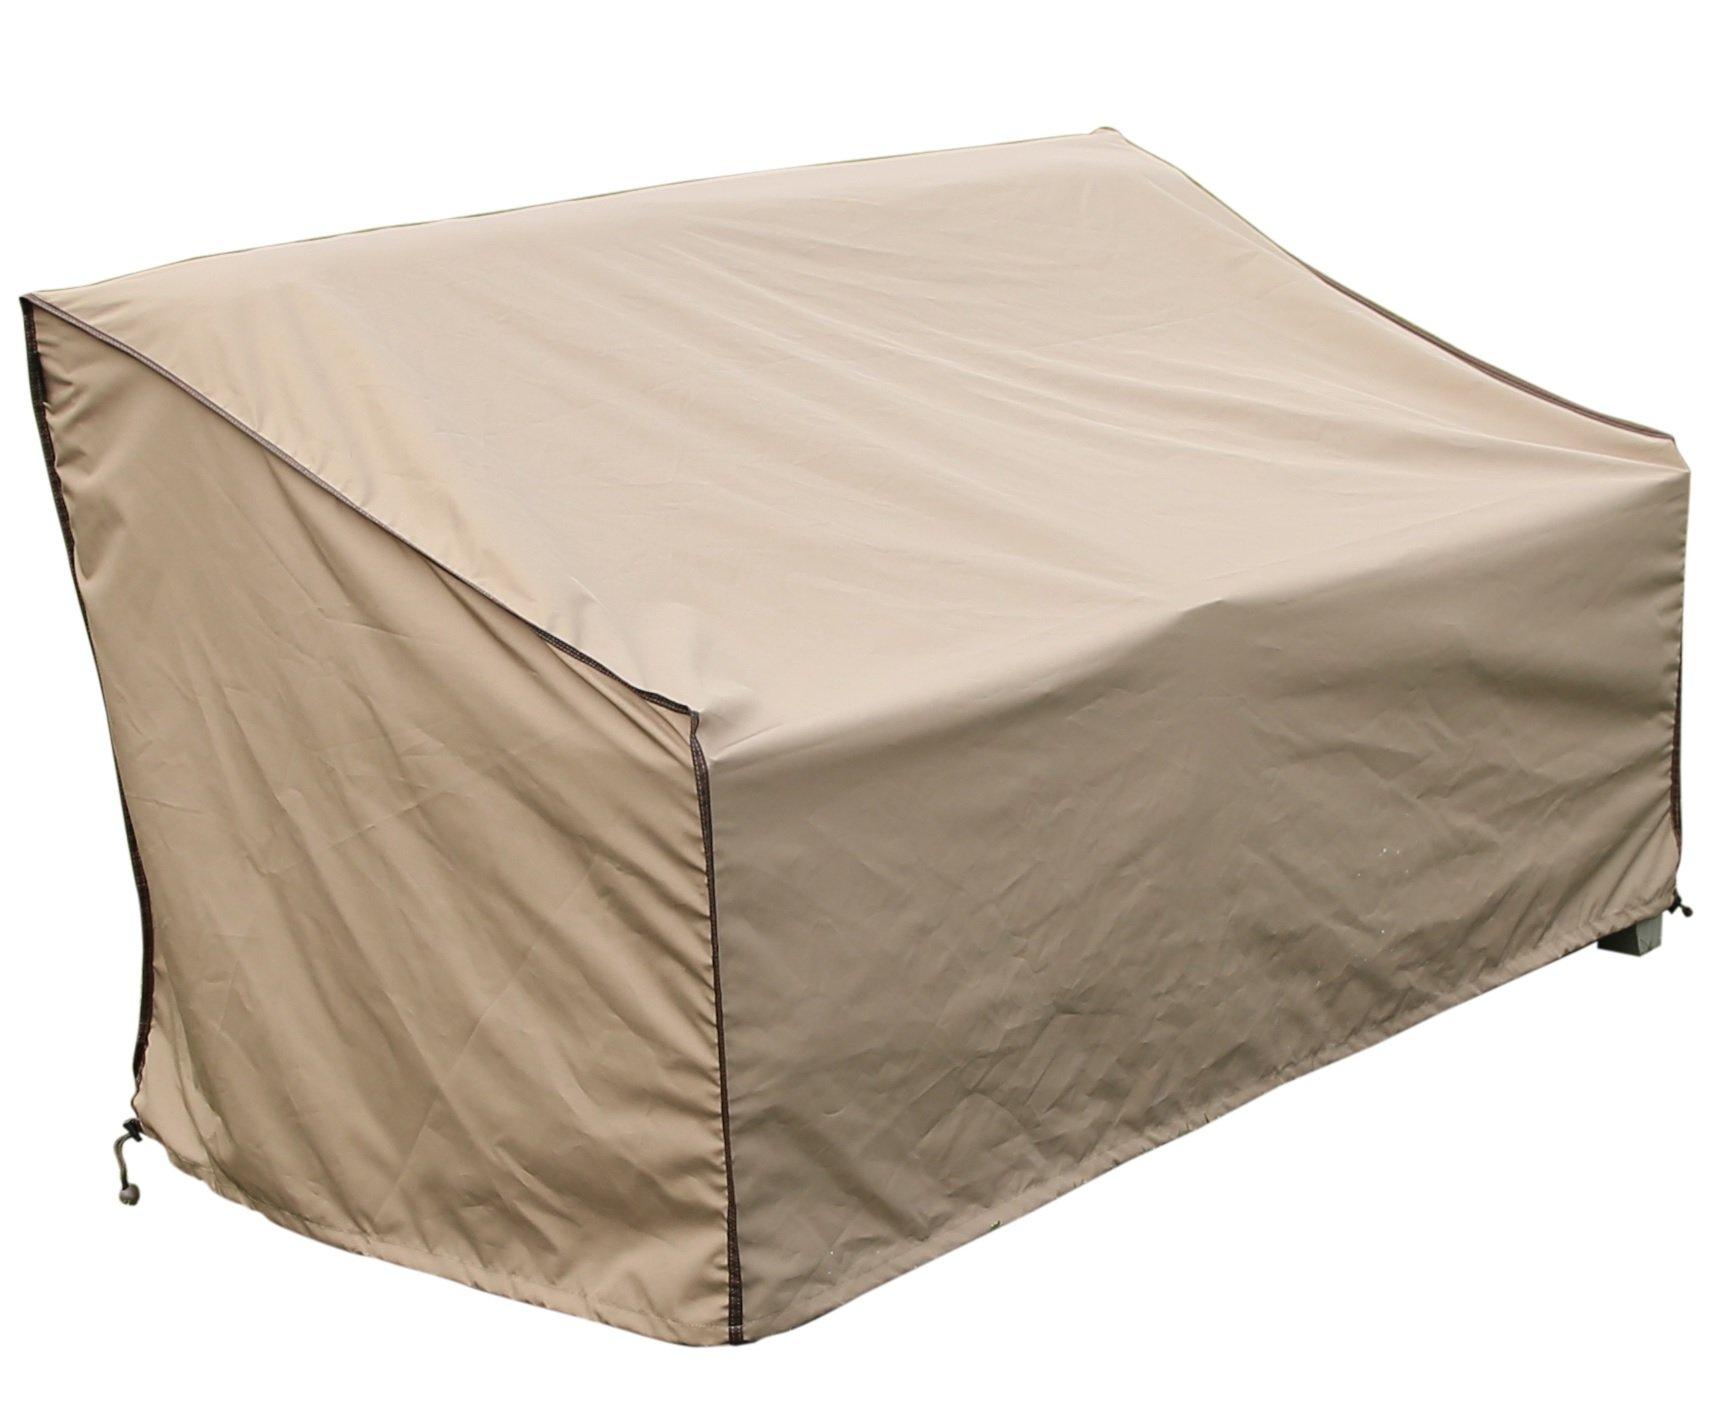 SORARA Single Seat Sofa Cover Outdoor Patio Porch Furniture Cover, Water Resistant, 40'' L x 33'' W x 36'' H